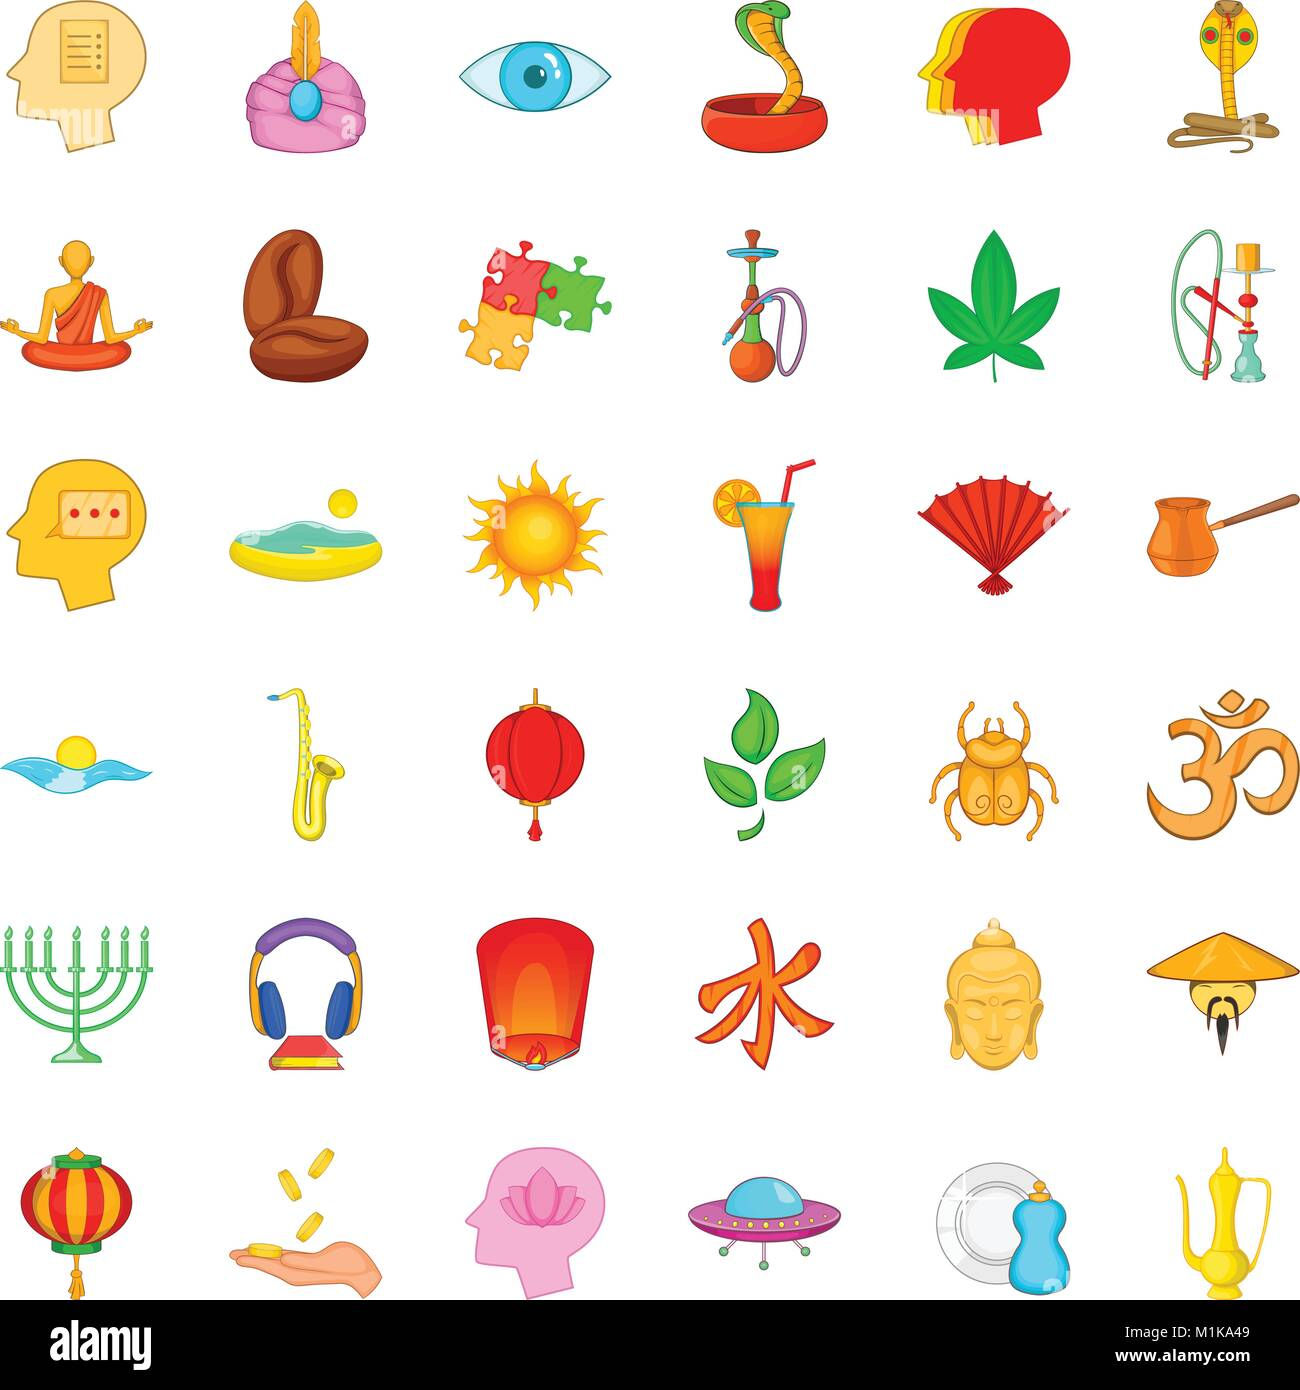 Meditation practice icons set, cartoon style - Stock Vector